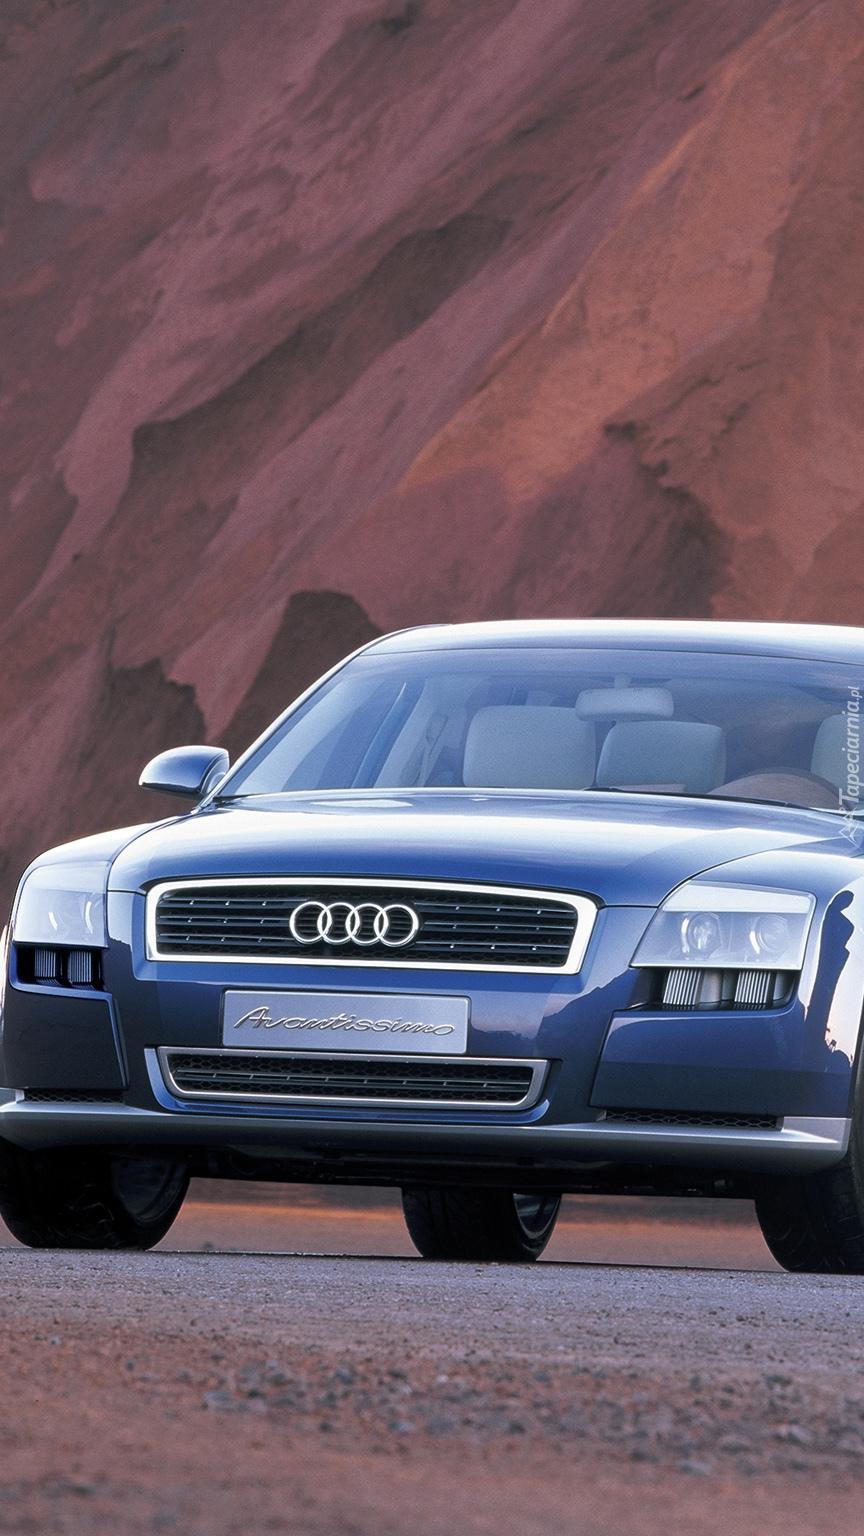 Prototyp Audi Avantissimo